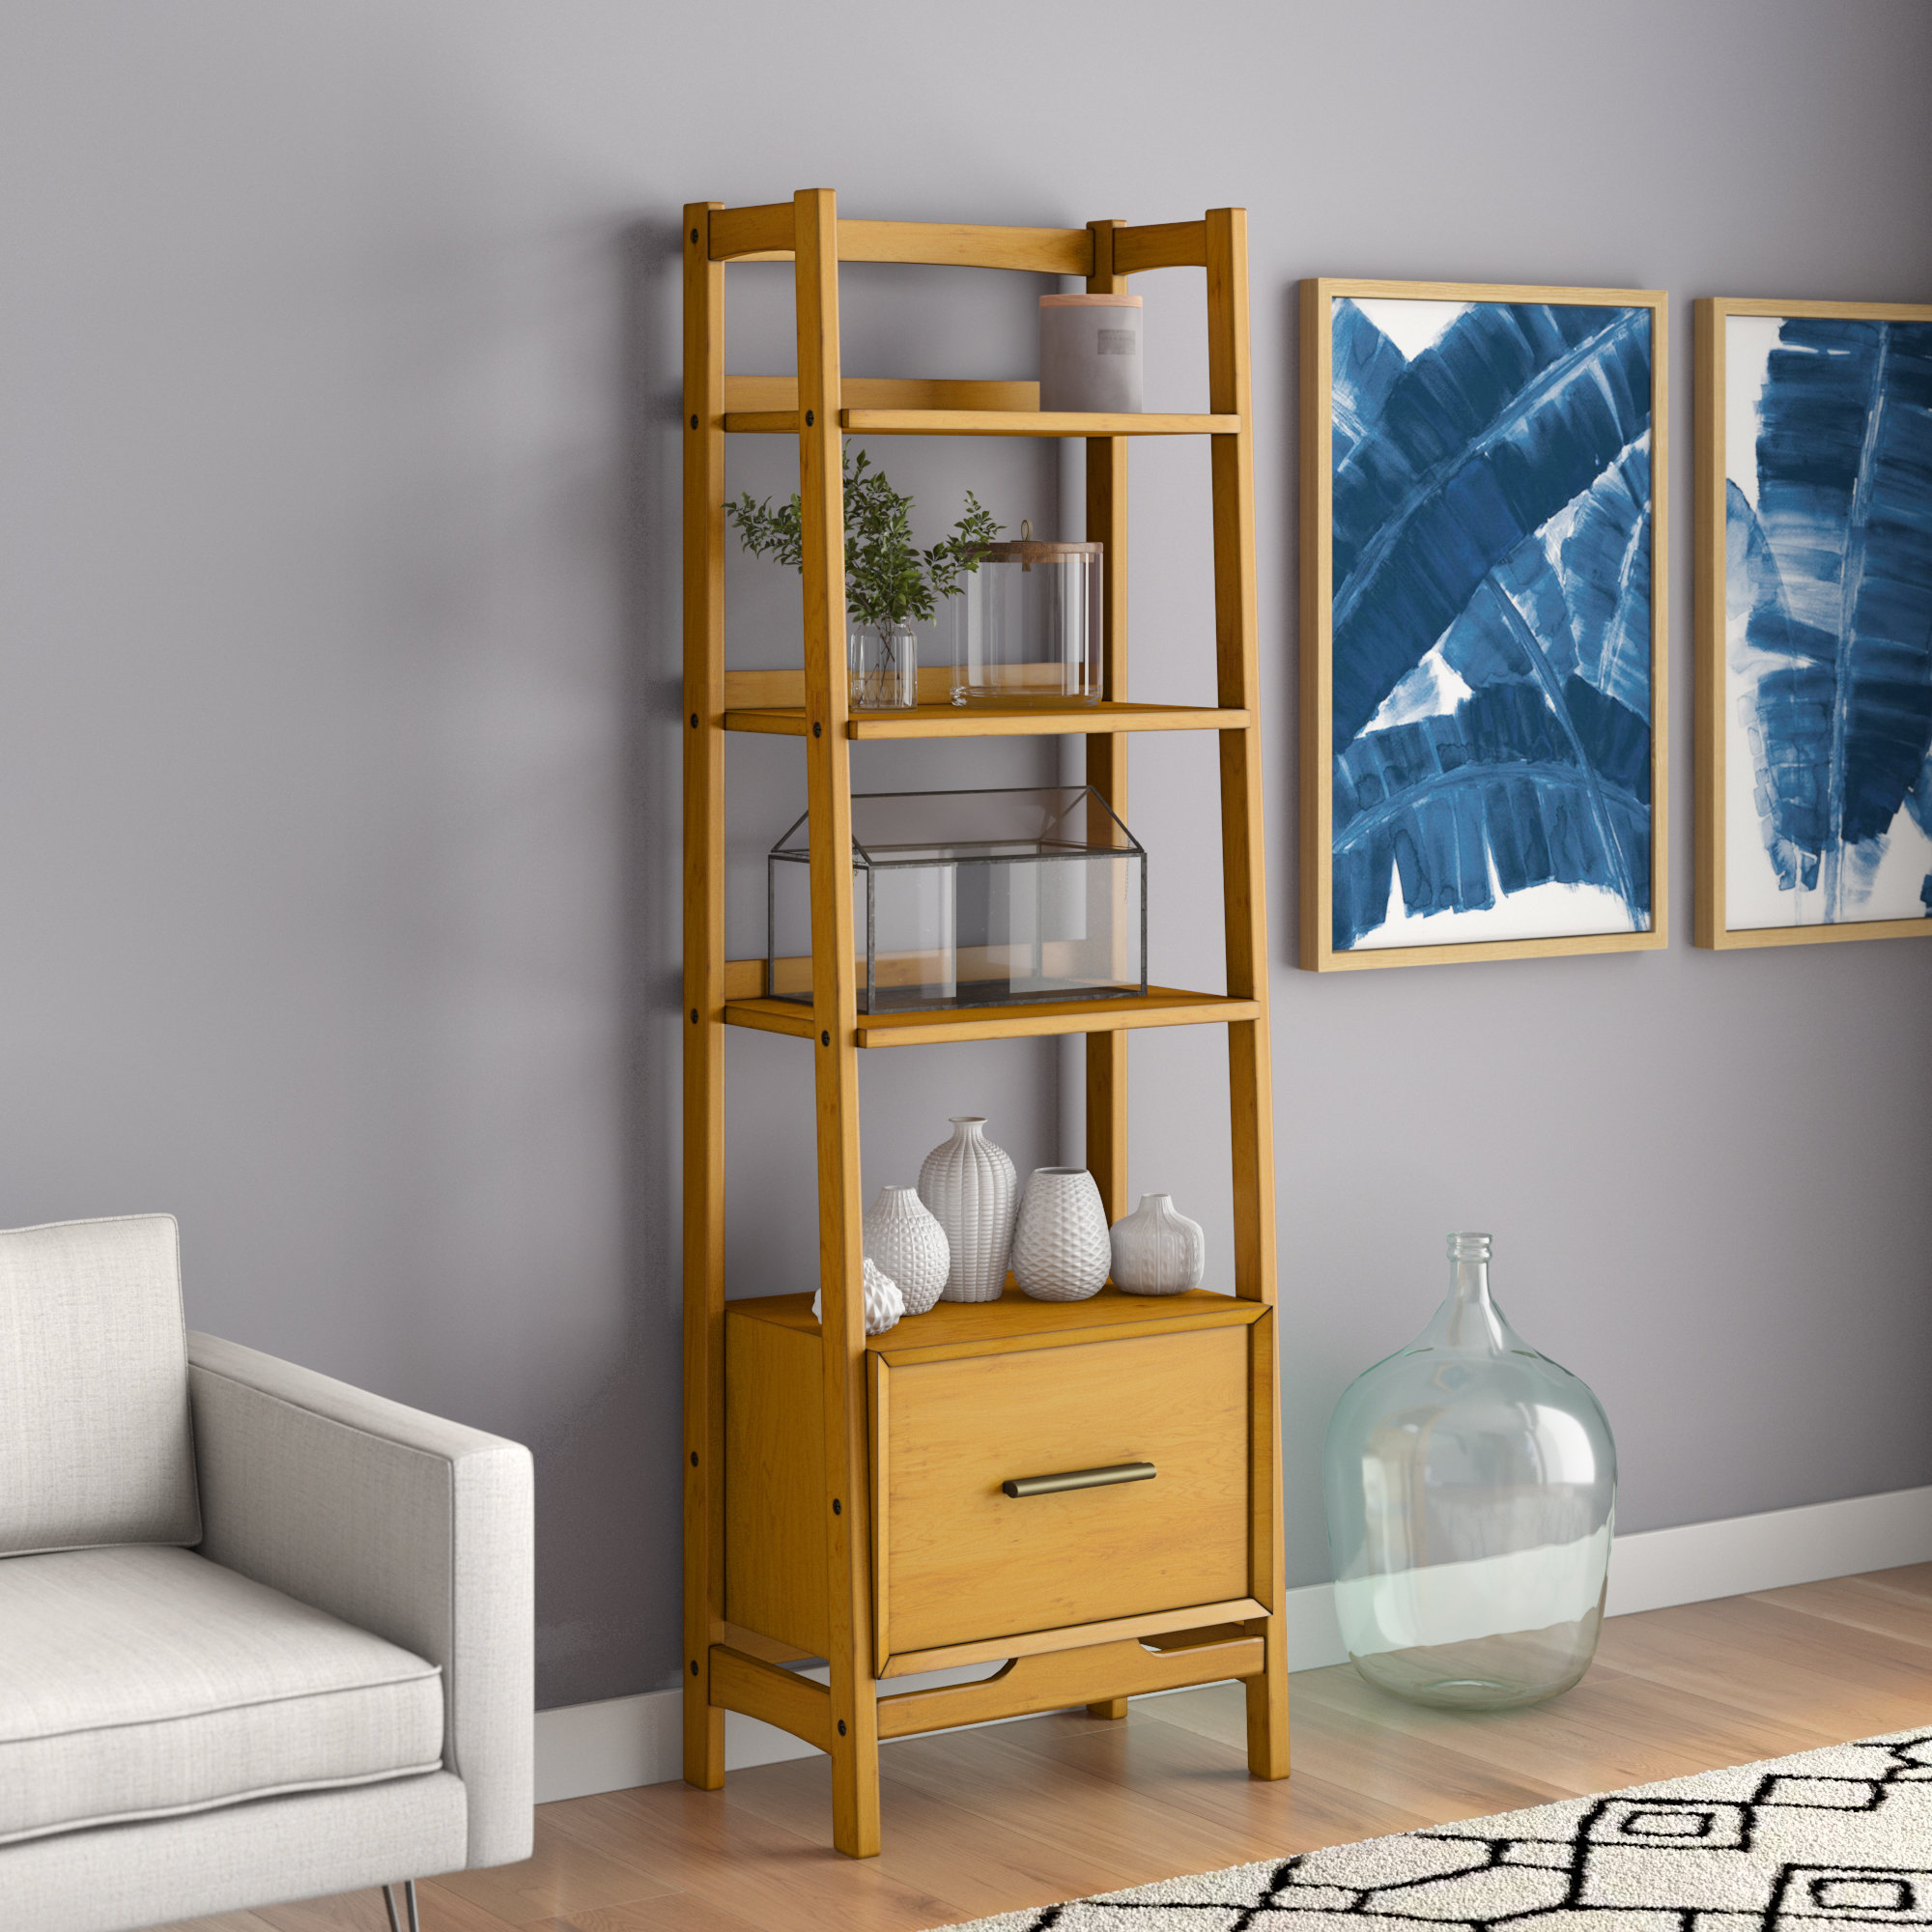 Current Destiny Etagere Bookcases Pertaining To Destiny Etagere Bookcase (View 3 of 20)